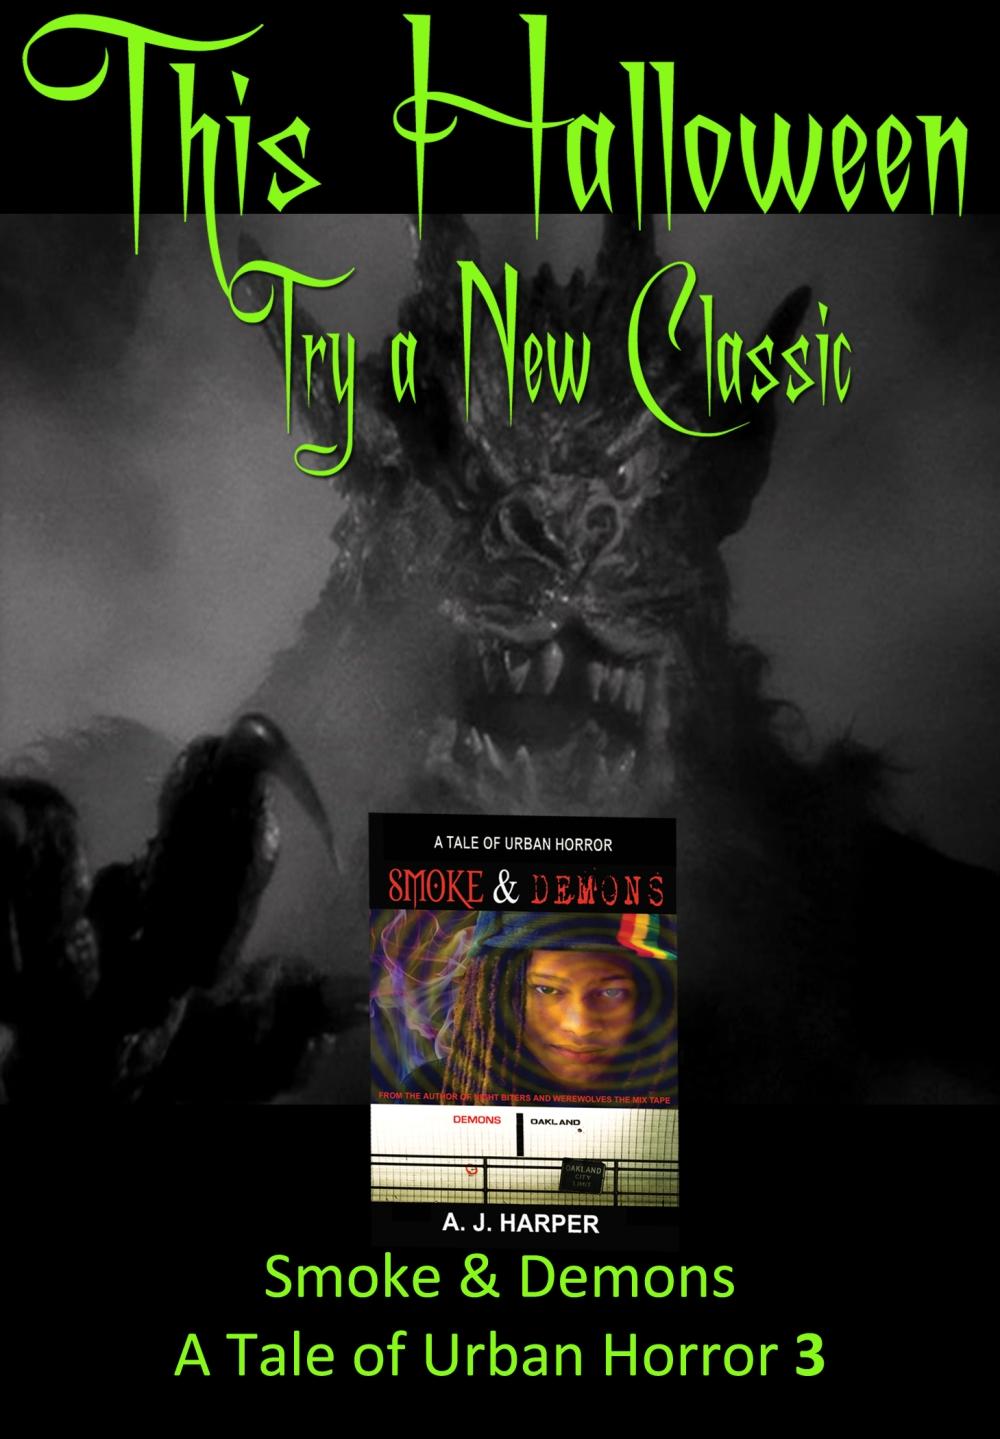 Smoke & Demons Halloween 3